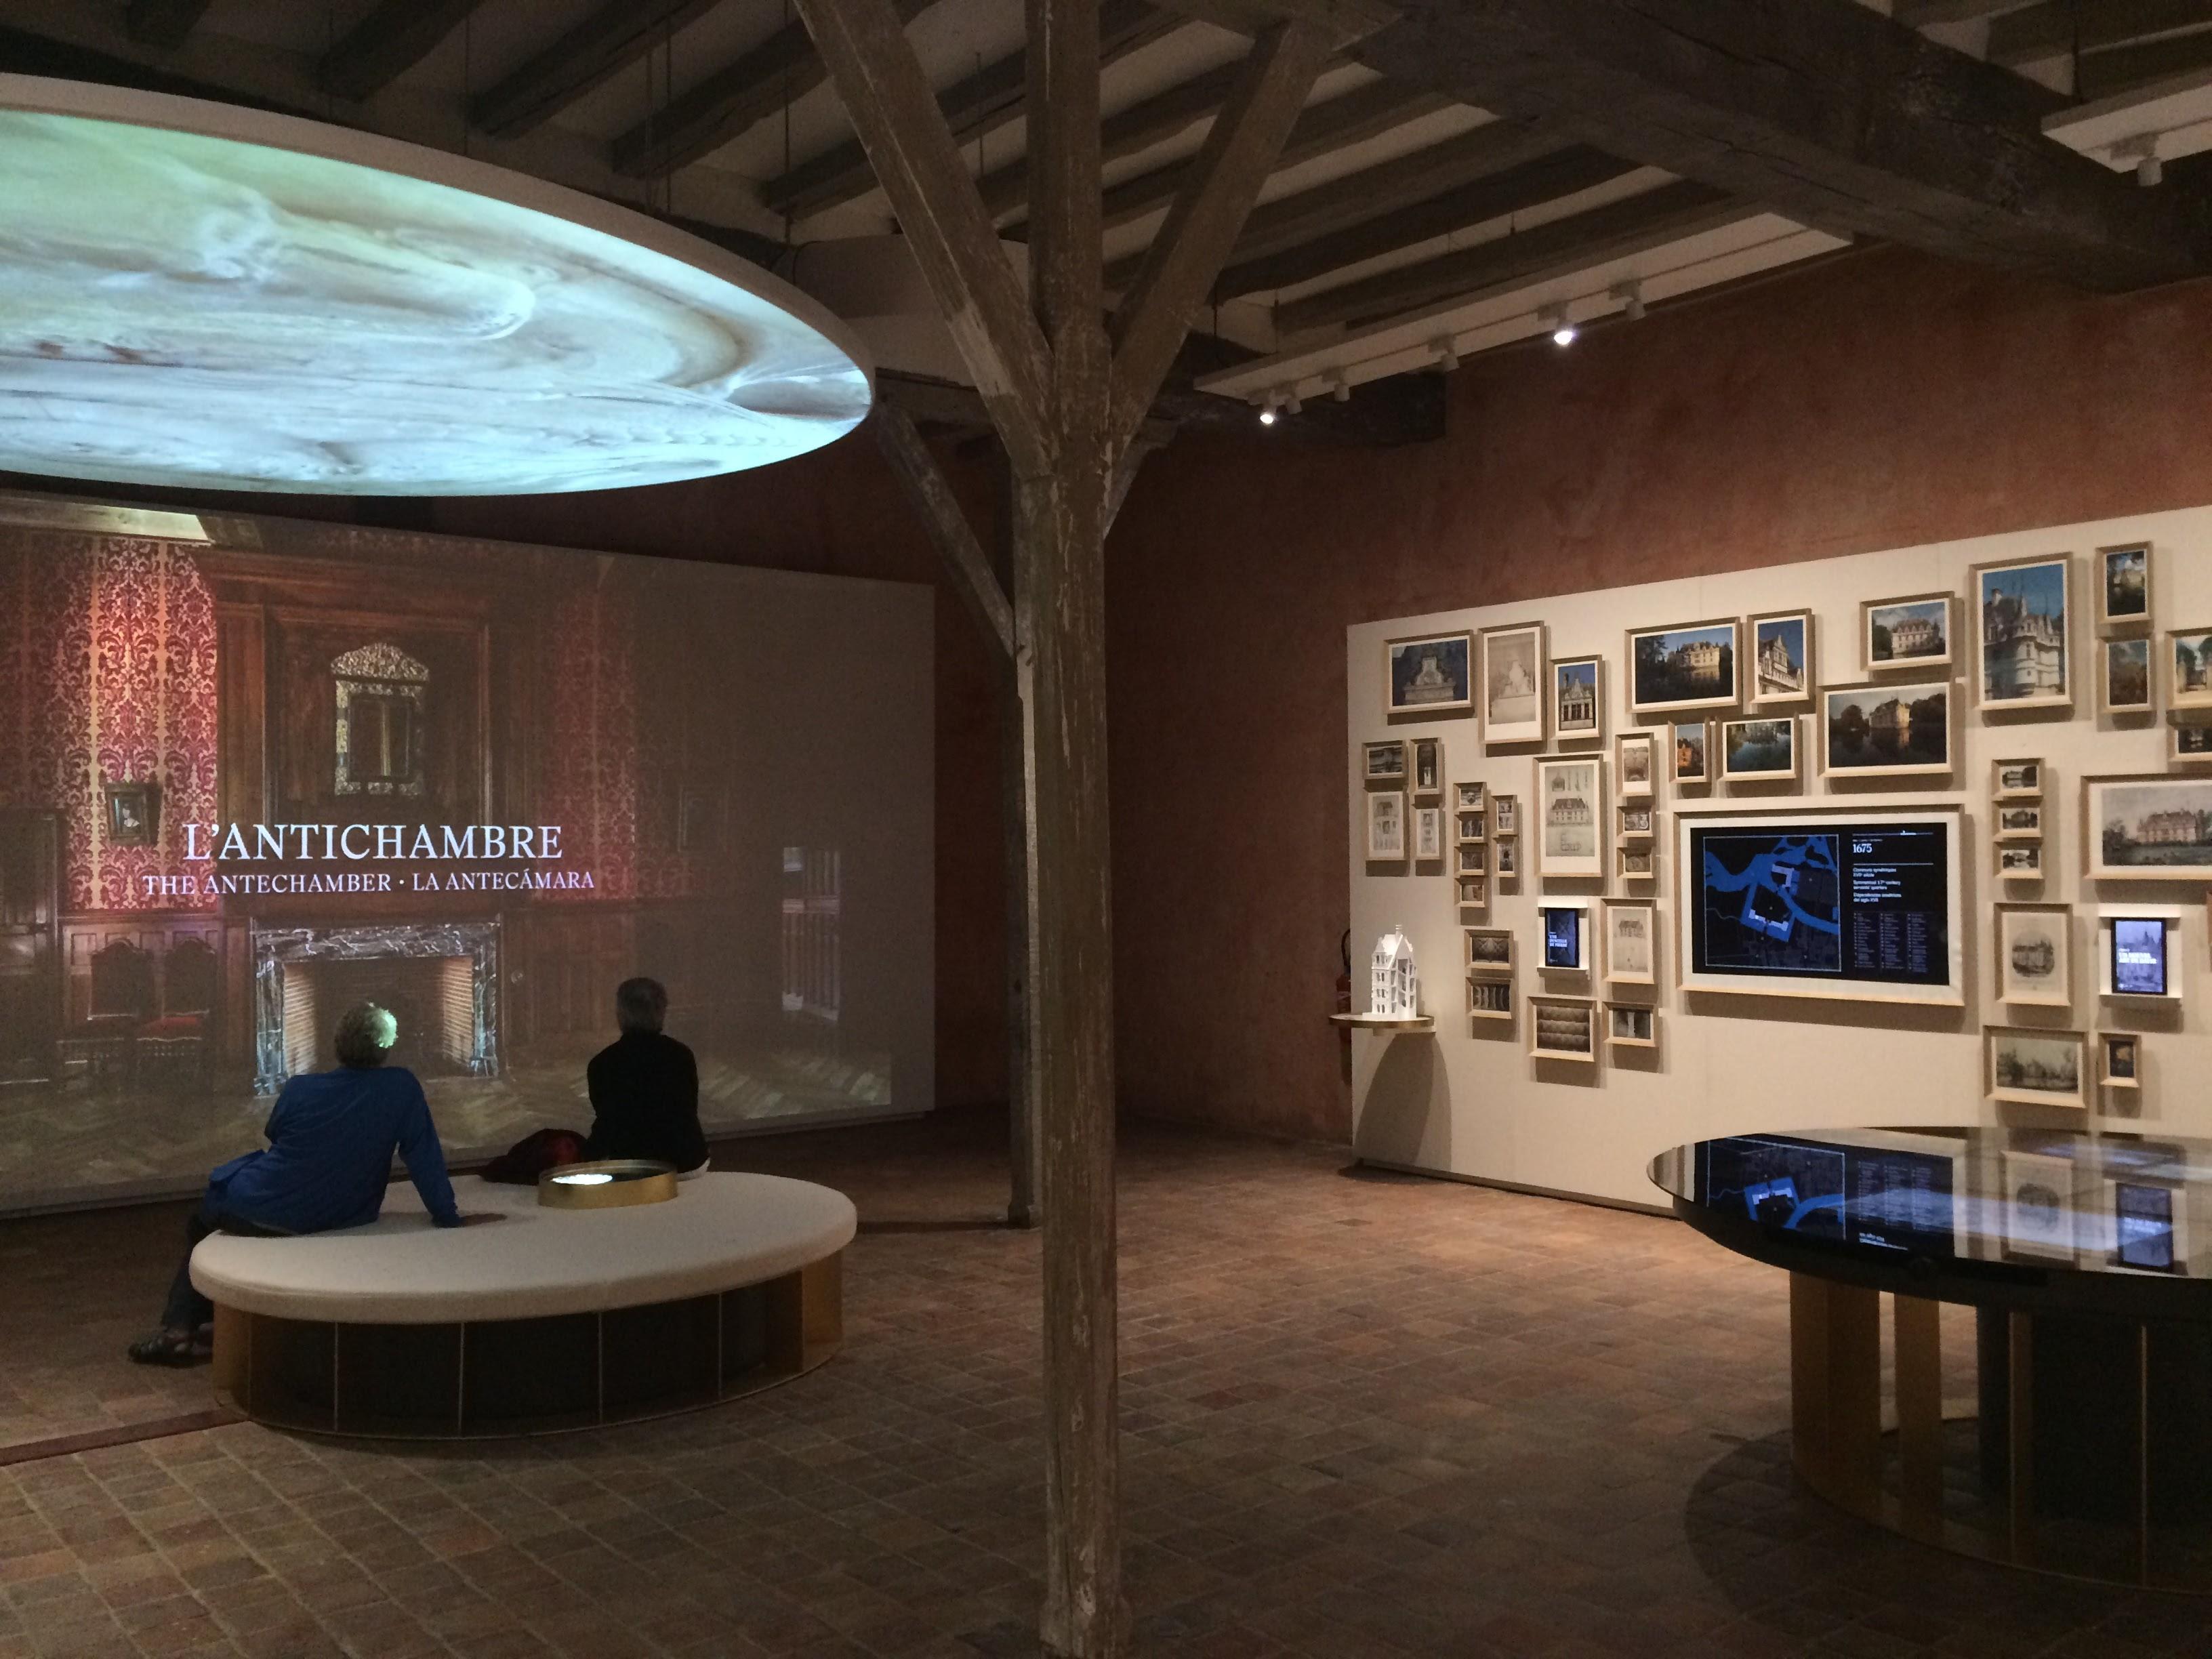 Scenographie multimedia, Chateau d'Azay le Rideau